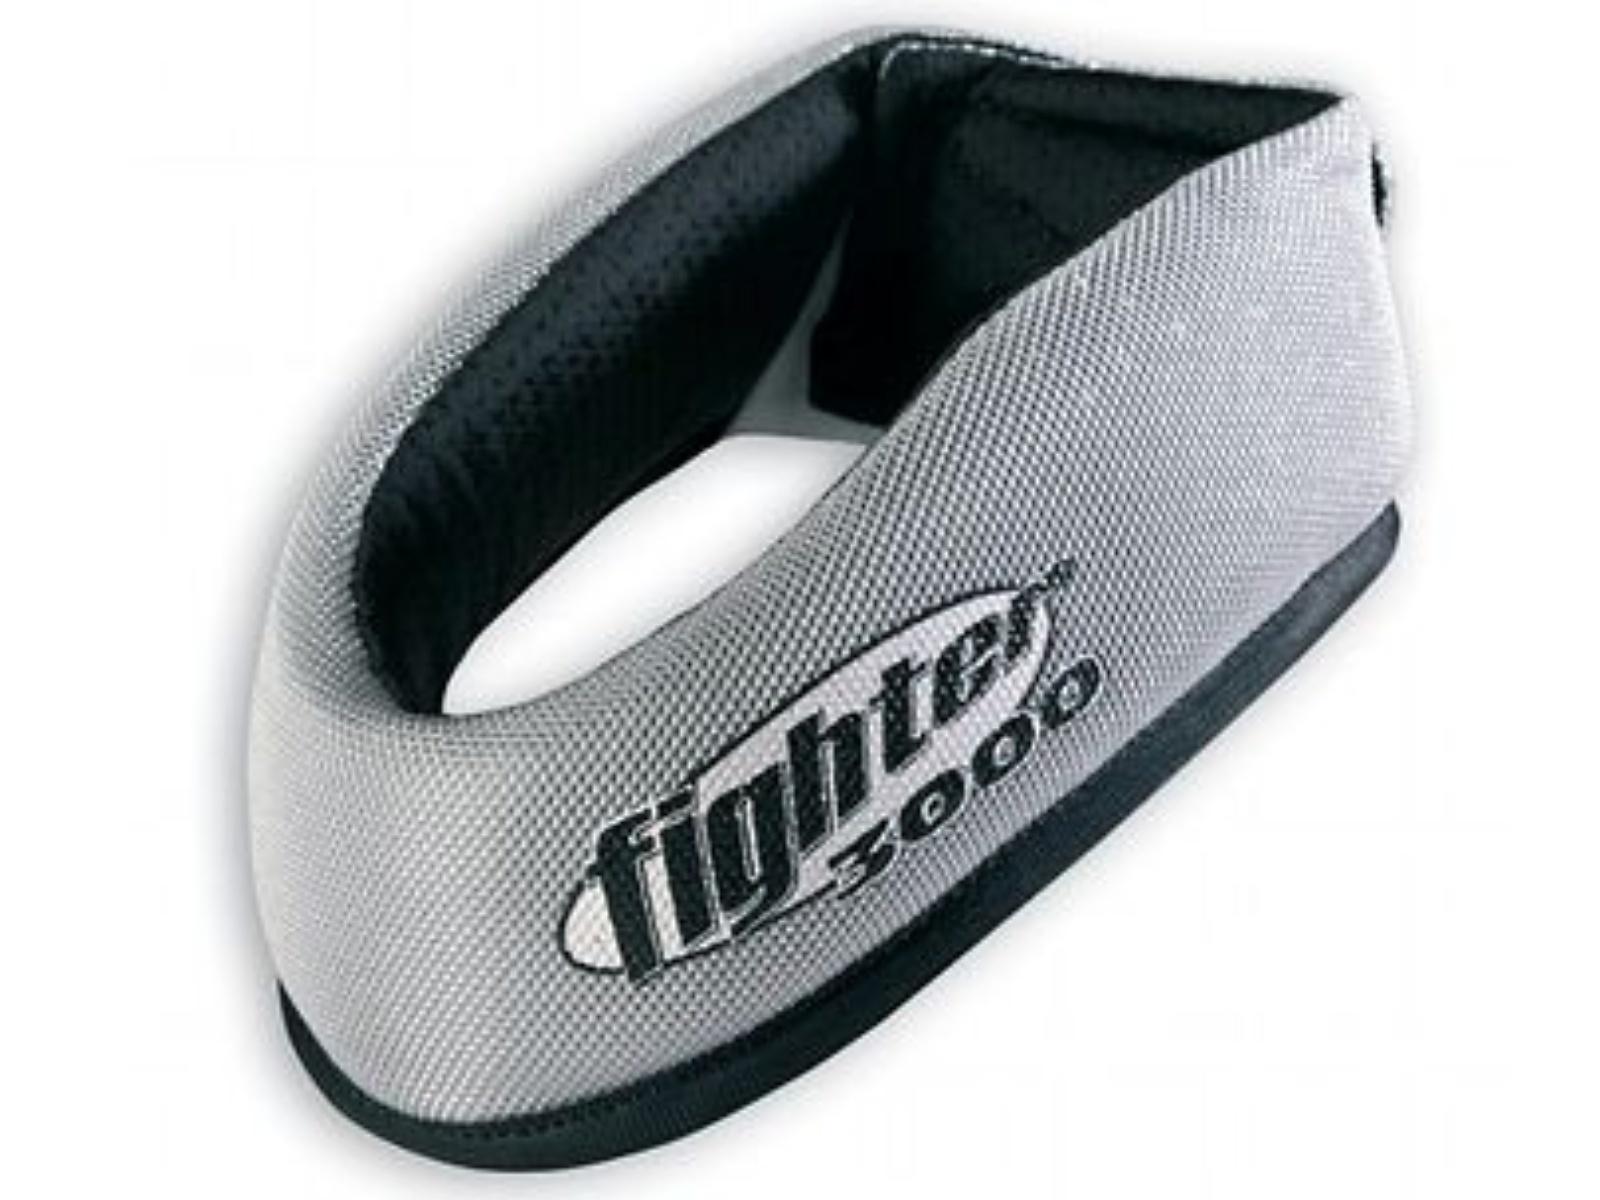 Hokejový chránič krku OPUS 3166 boy - vel. M/L